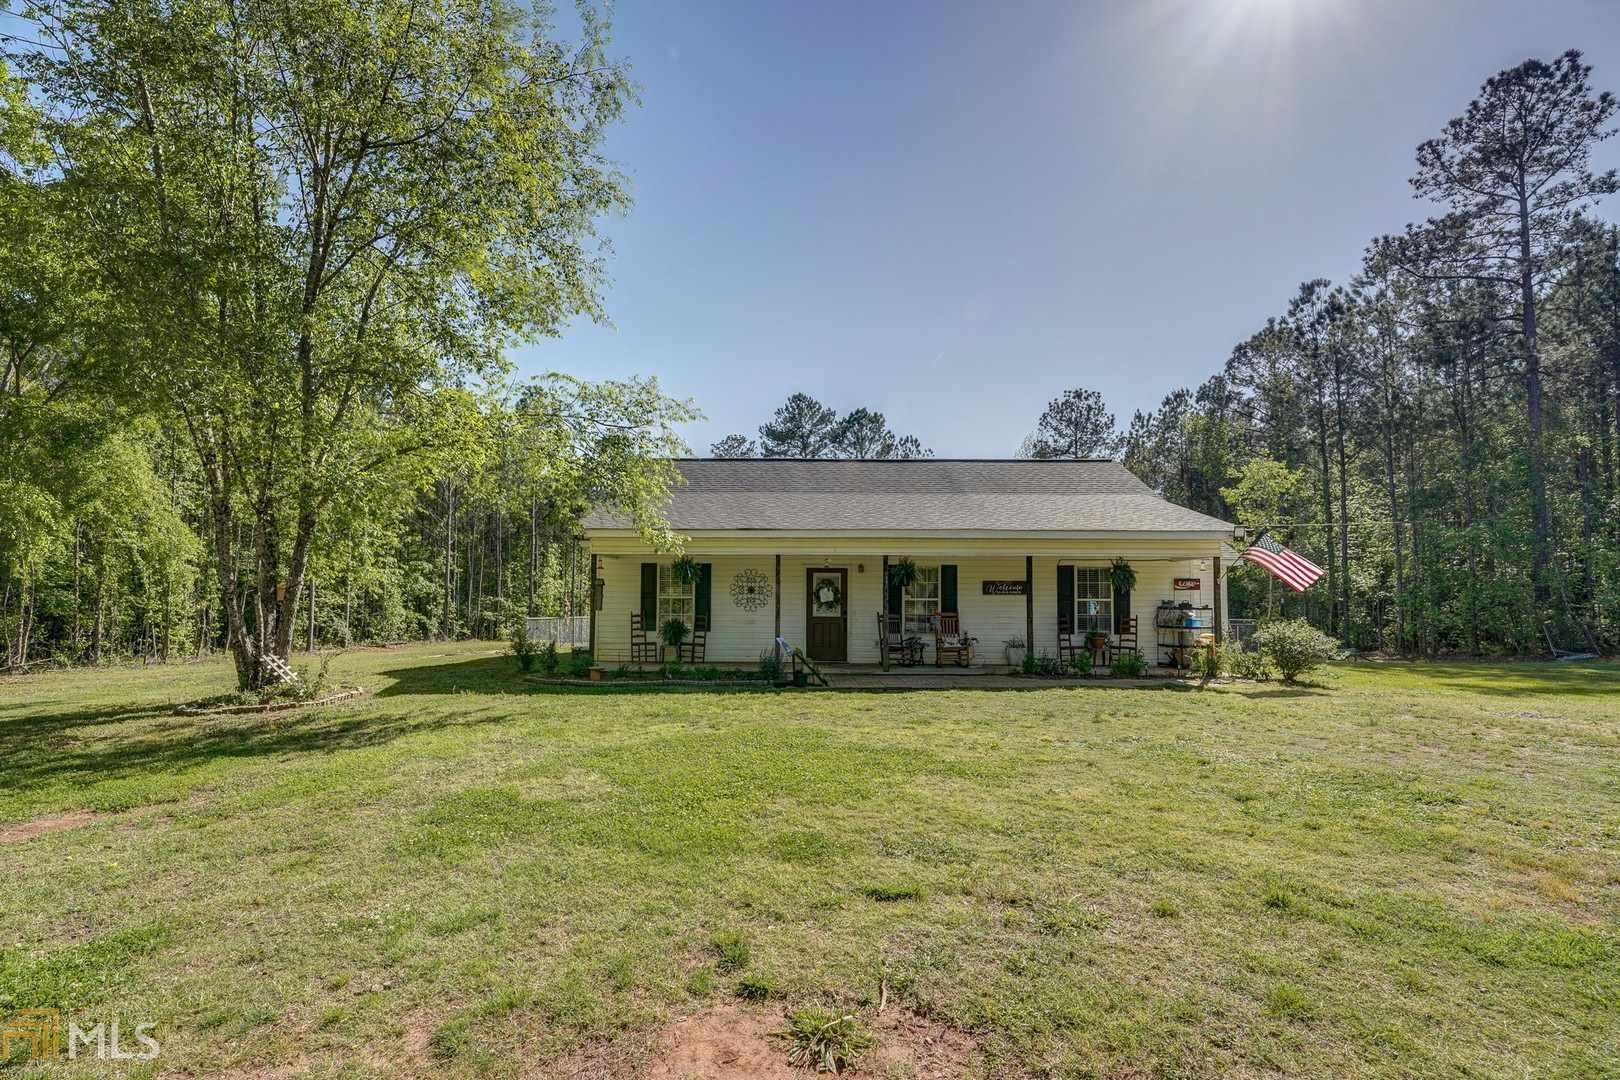 1148 Oconee Forest Rd, Monticello, GA 31064 - MLS#: 8966355